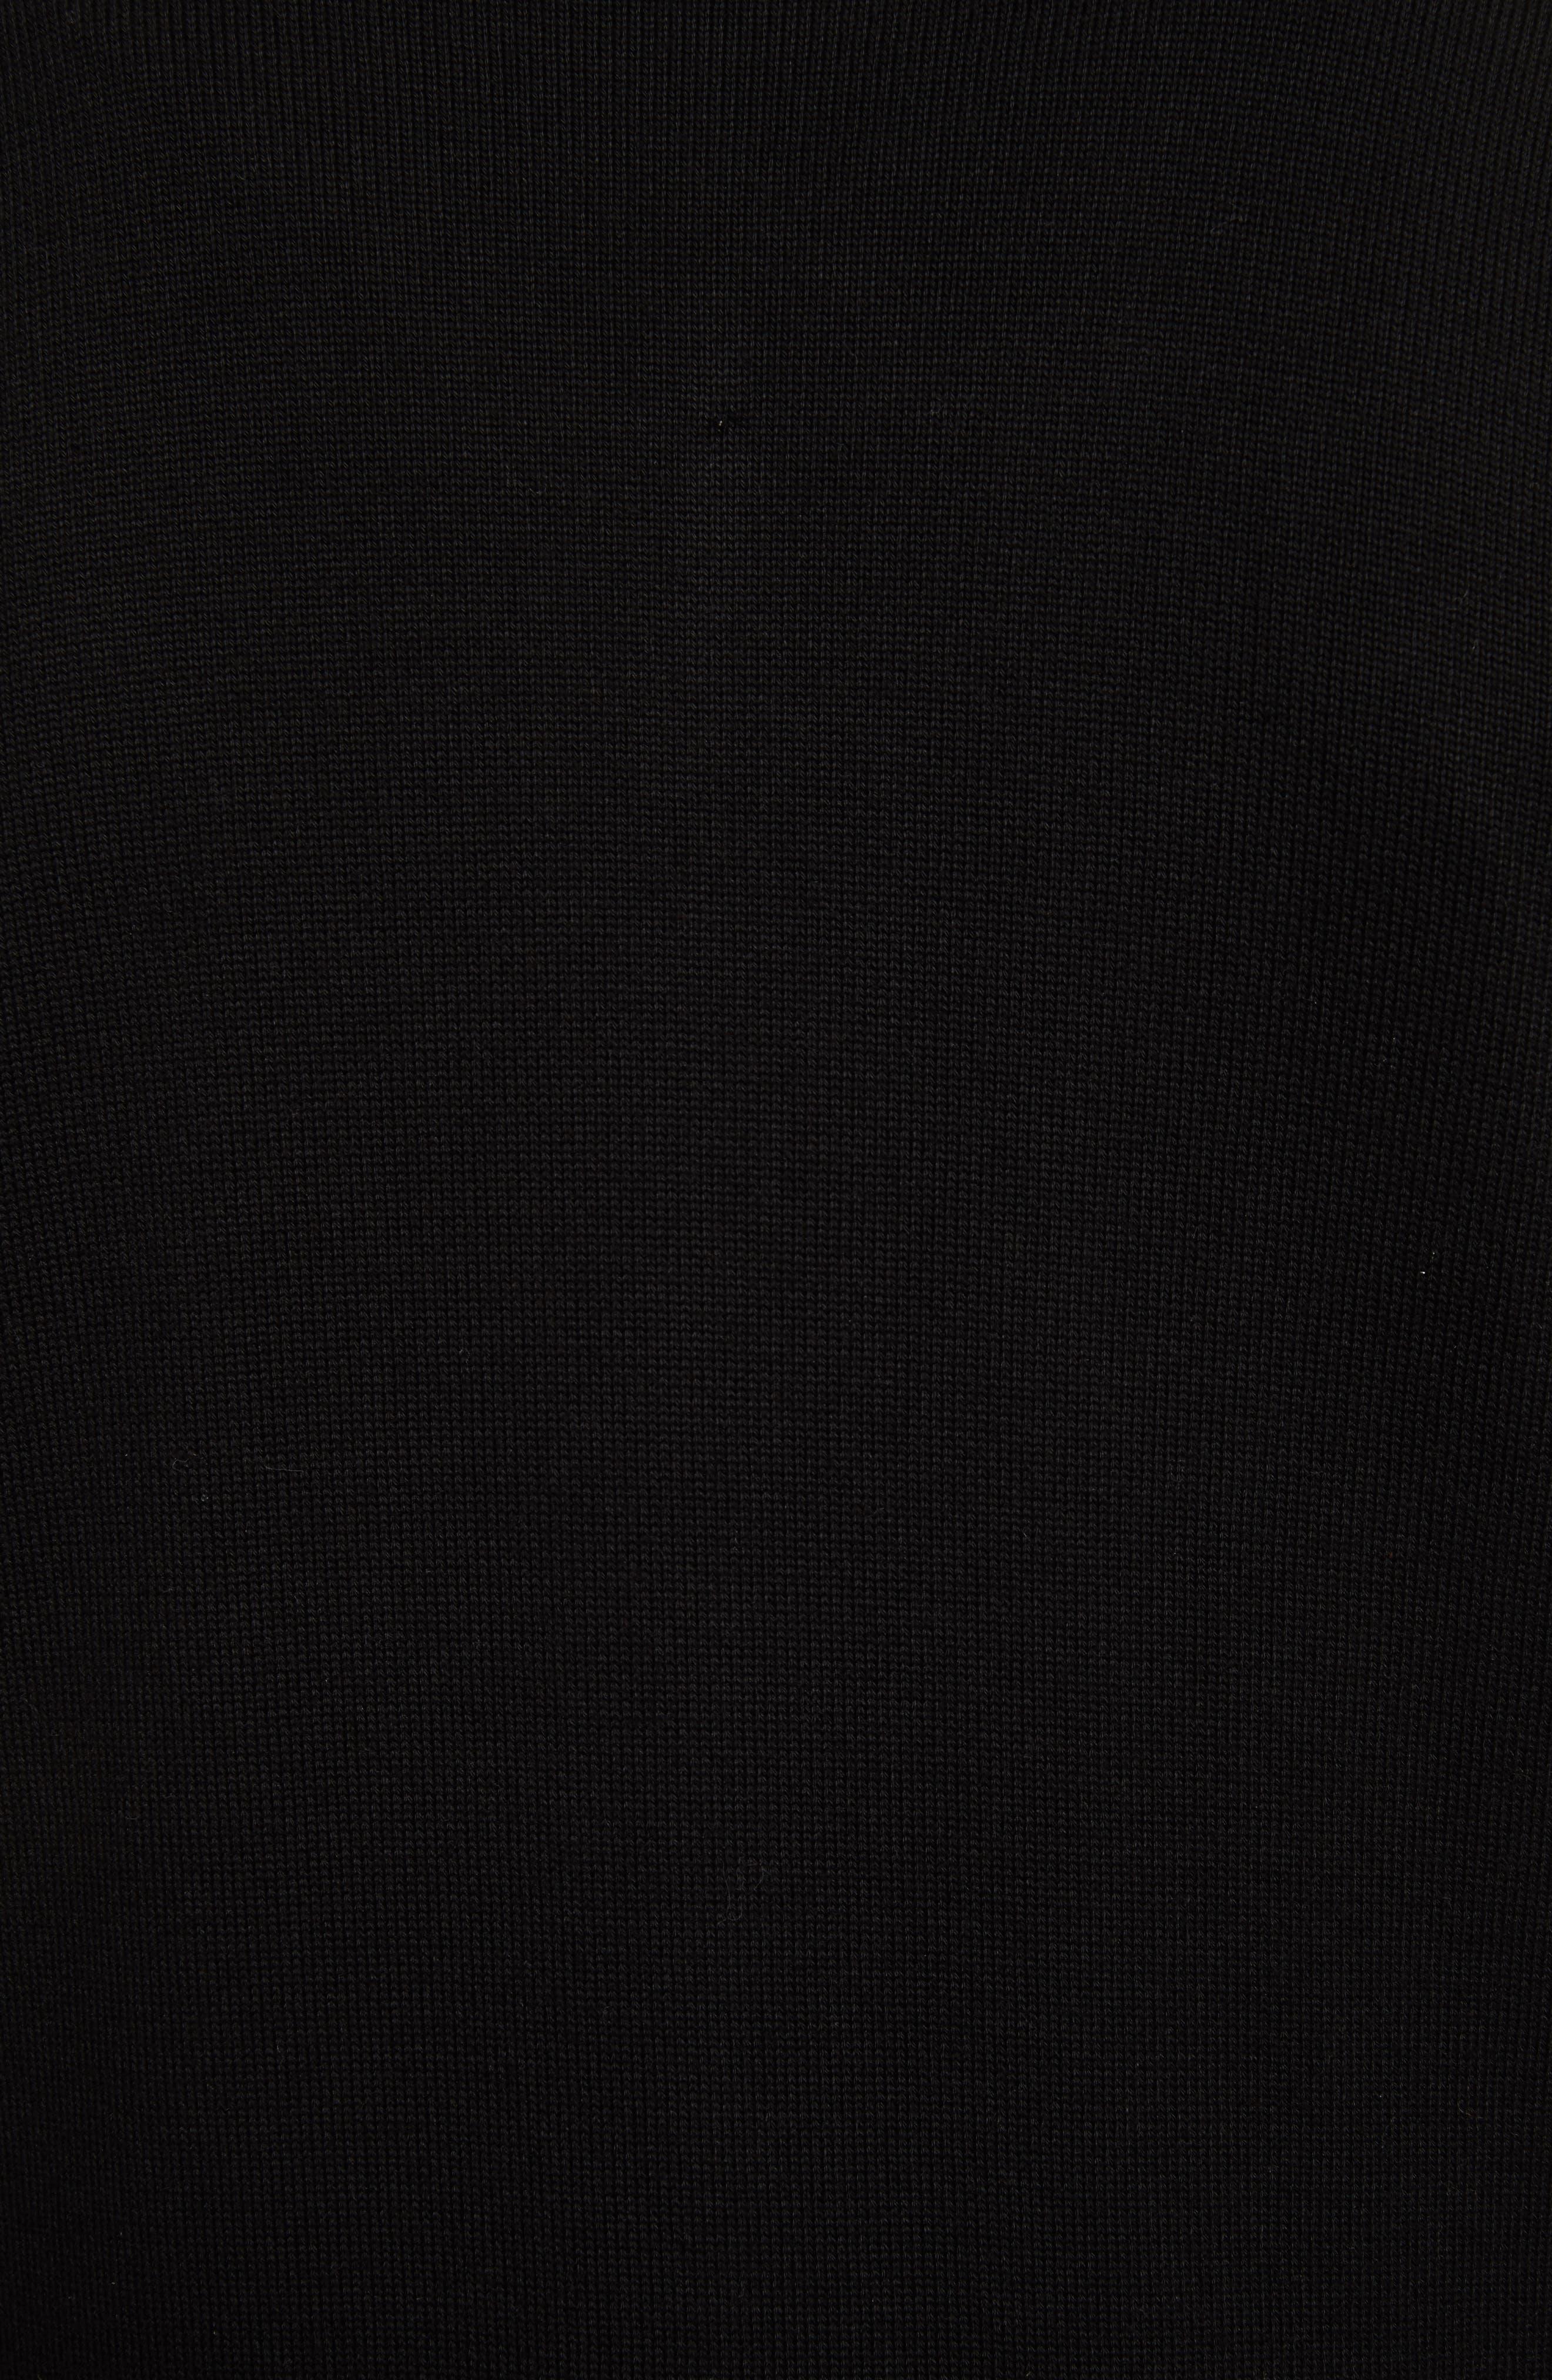 Allerford Knit Cotton Jacket,                             Alternate thumbnail 5, color,                             Black